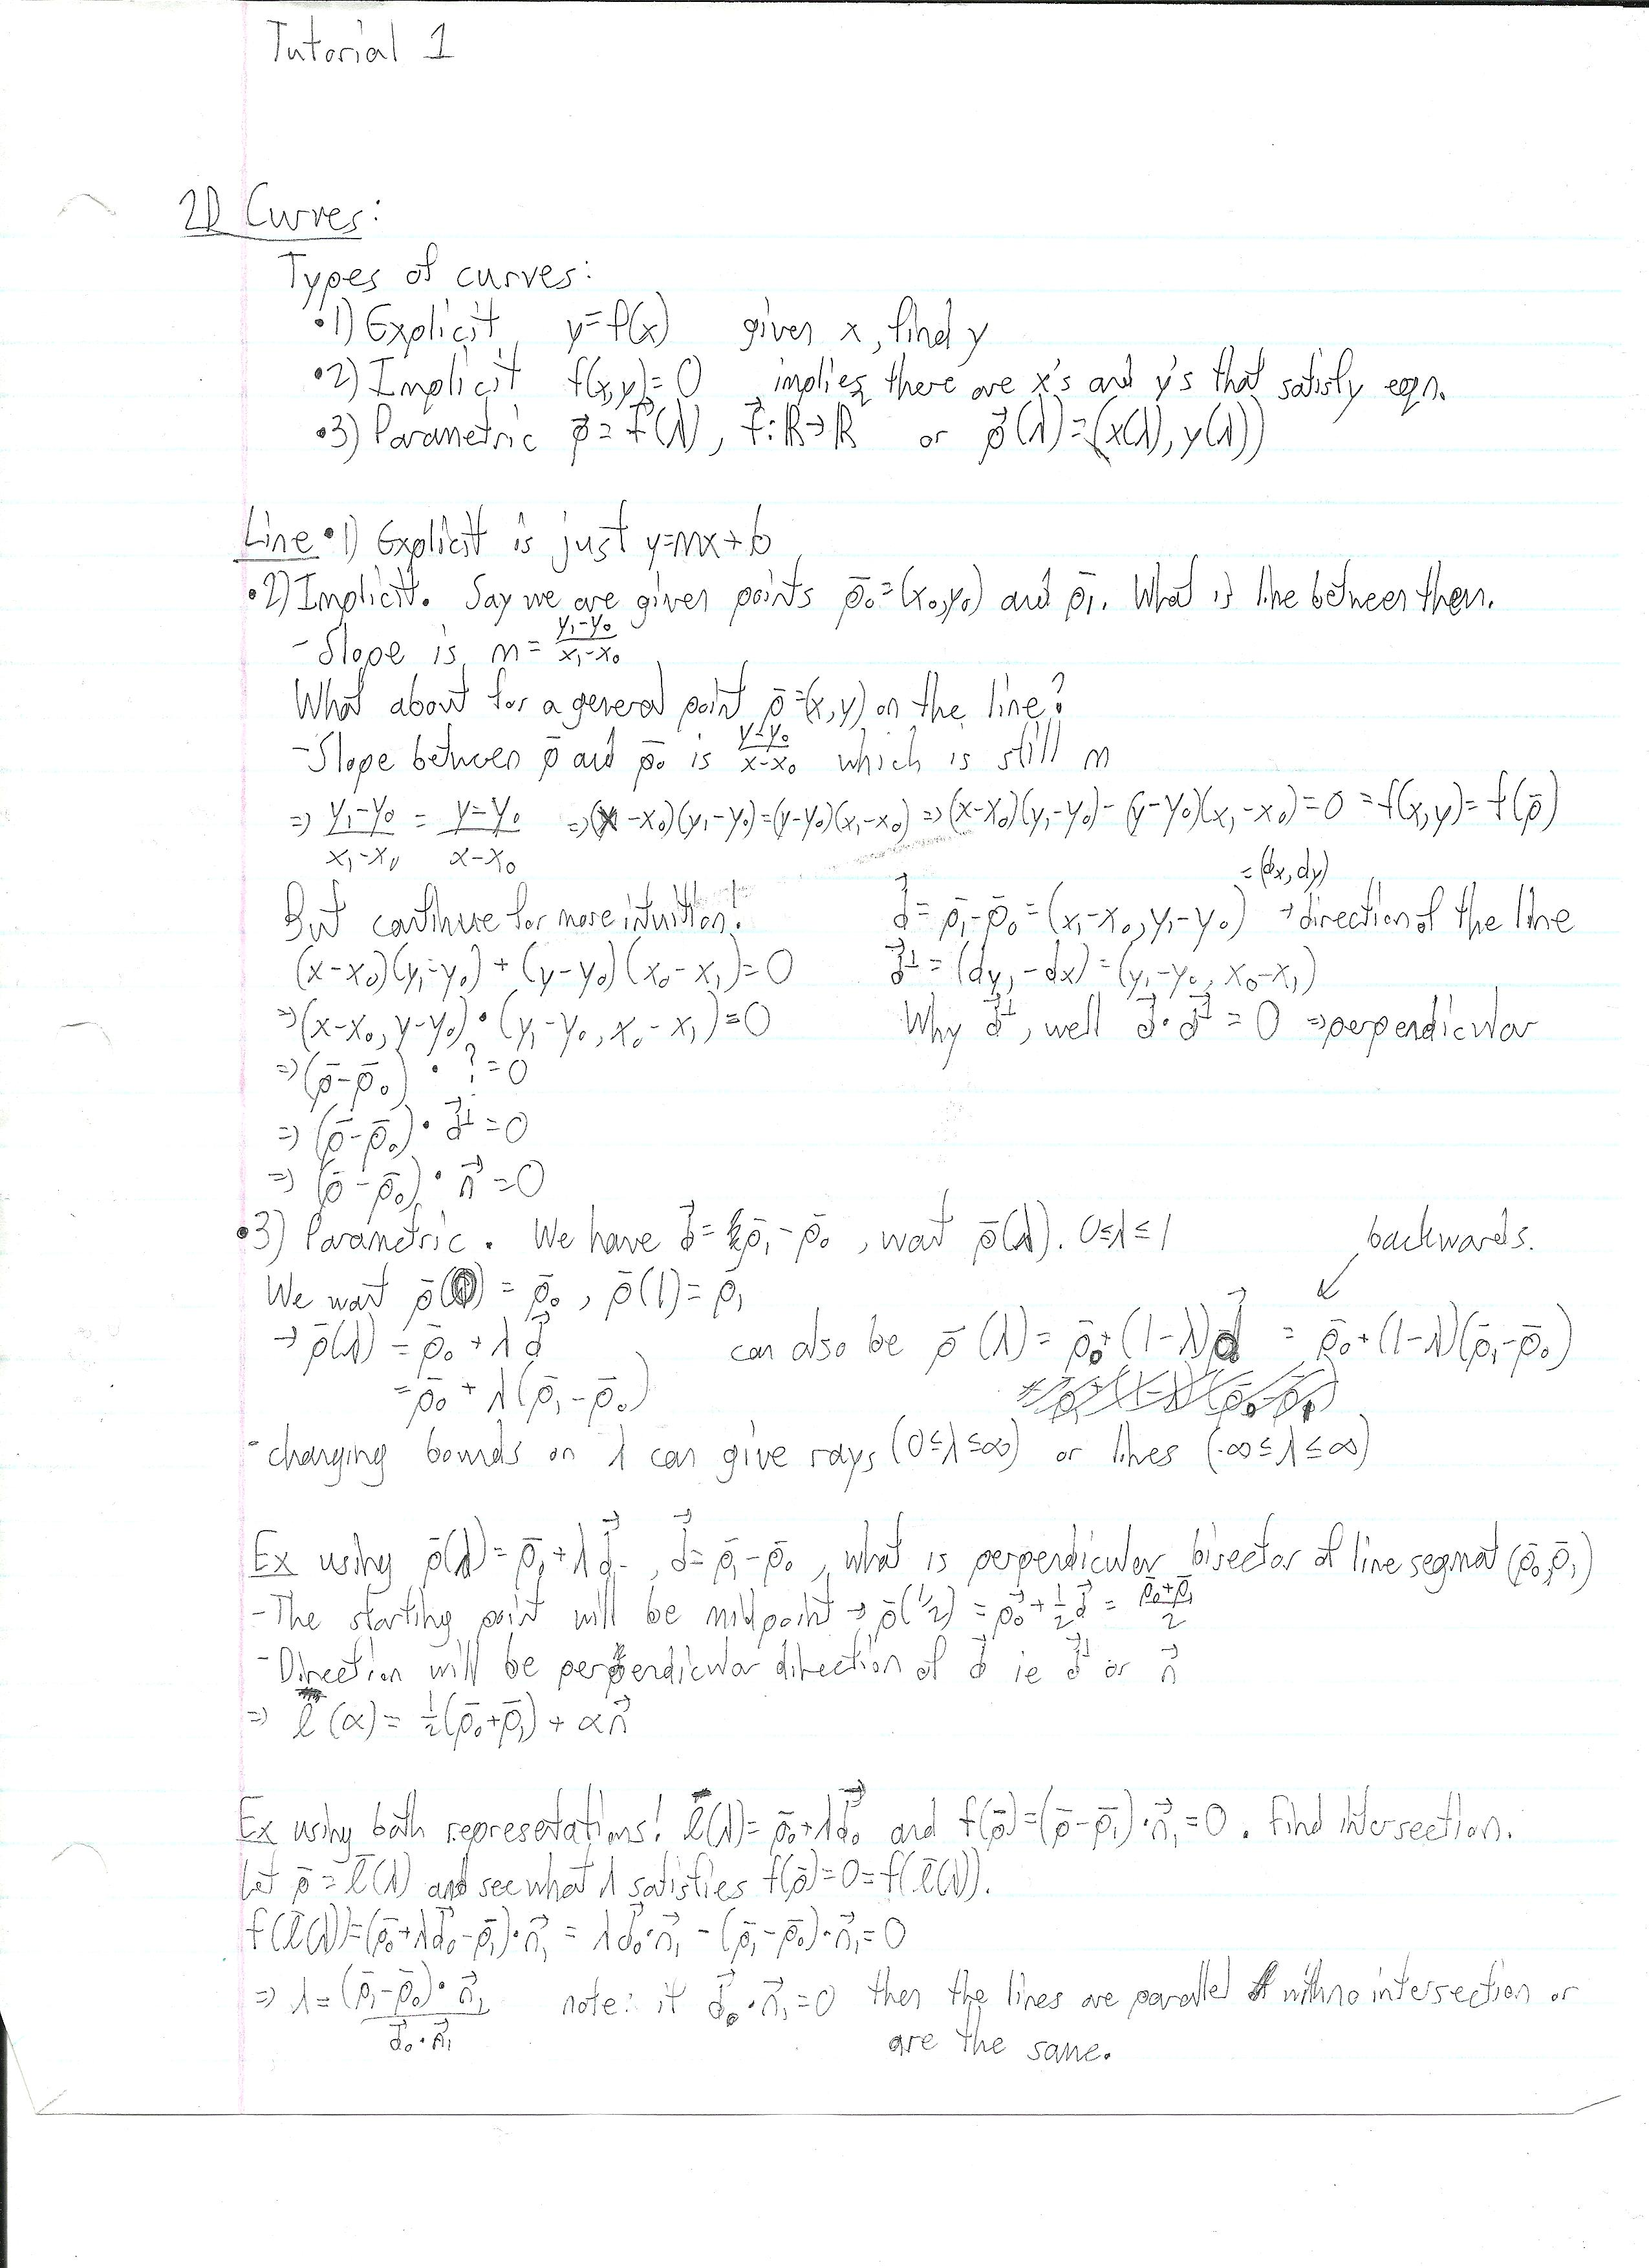 Bresenham Line Drawing Algorithm Tutorial : Liviu mihai calin